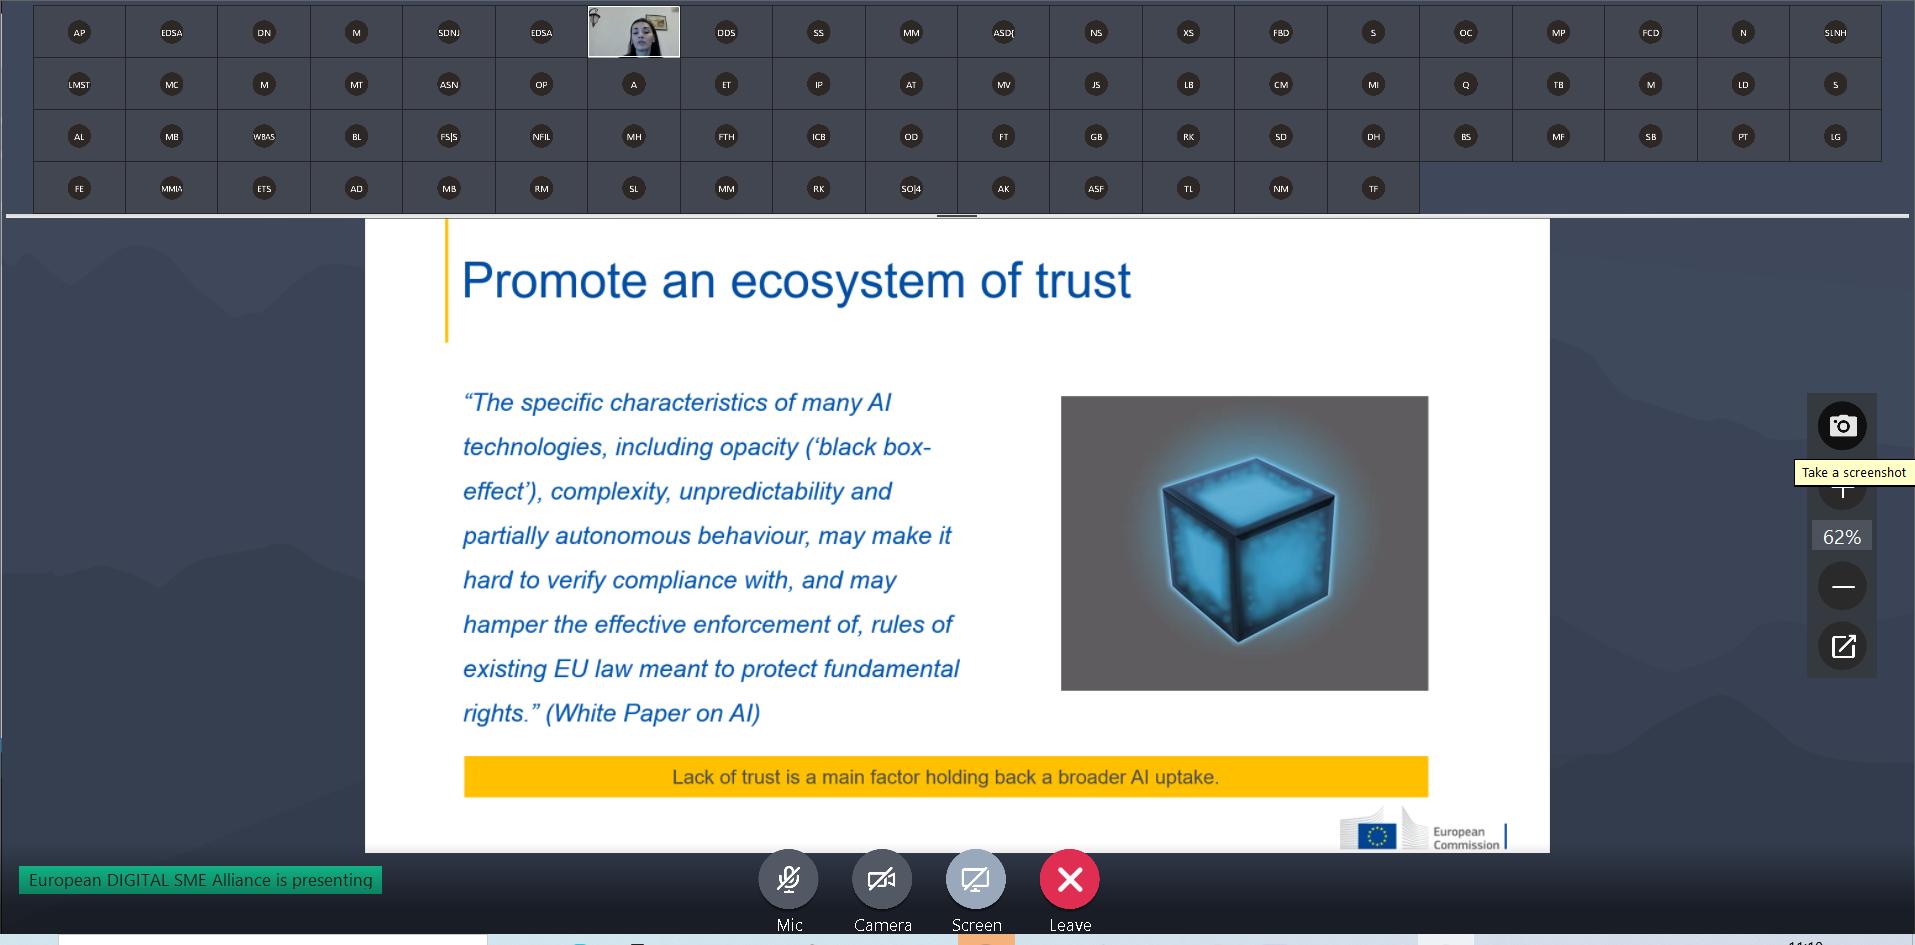 SME Focus Group on AI November 2020: trustworthy AI for SMEs 4